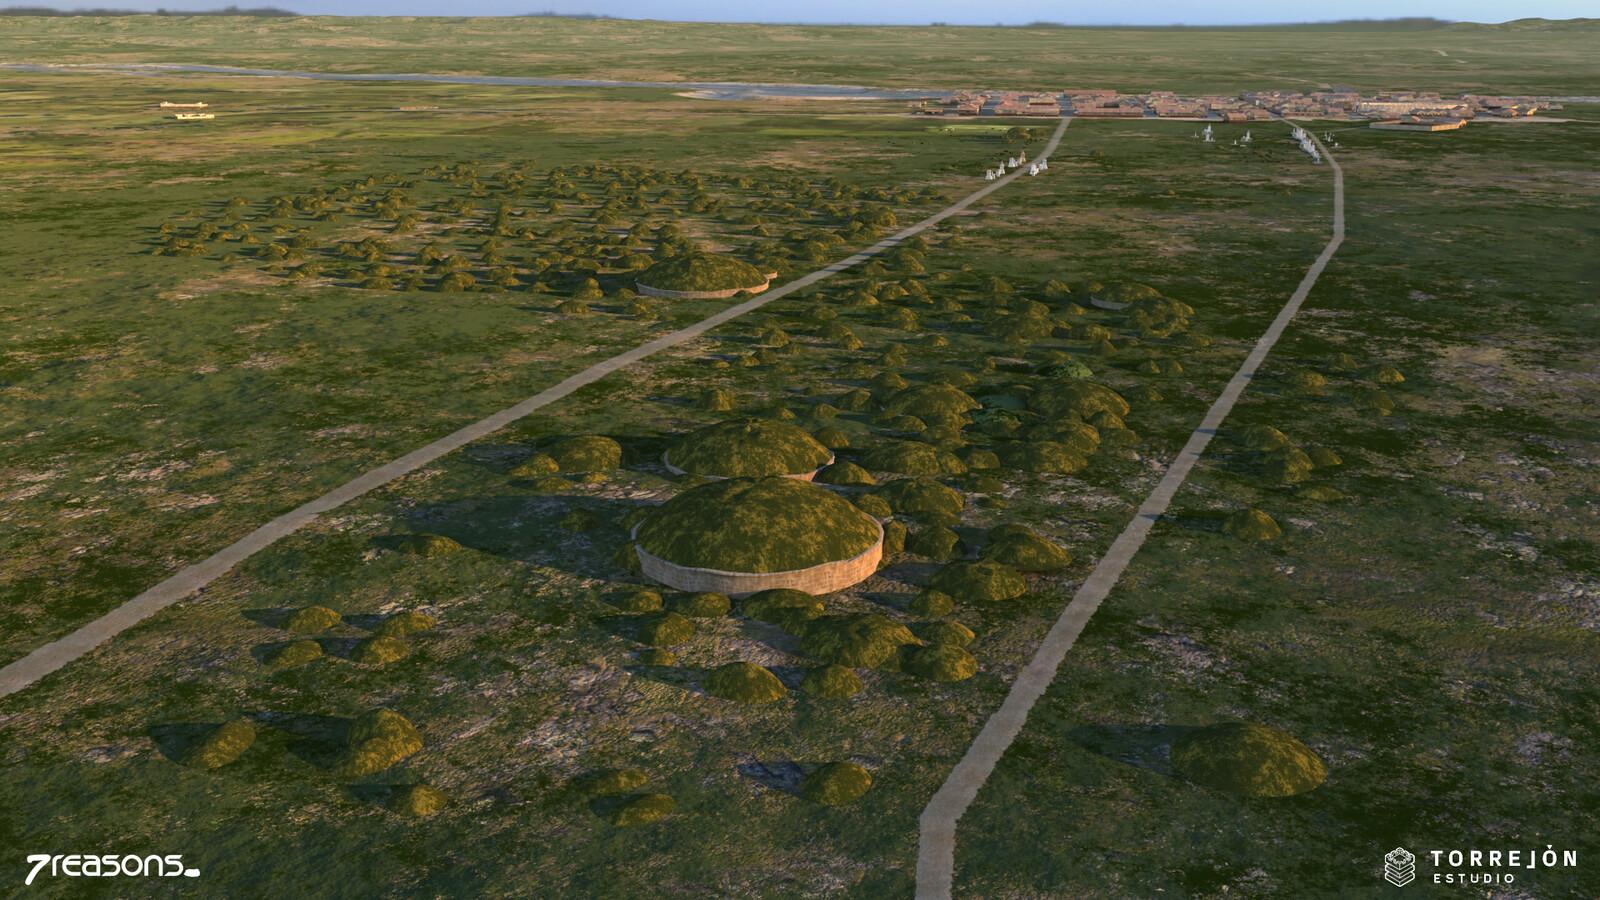 3D visualisation of the graveyard next to Flavia Solva.